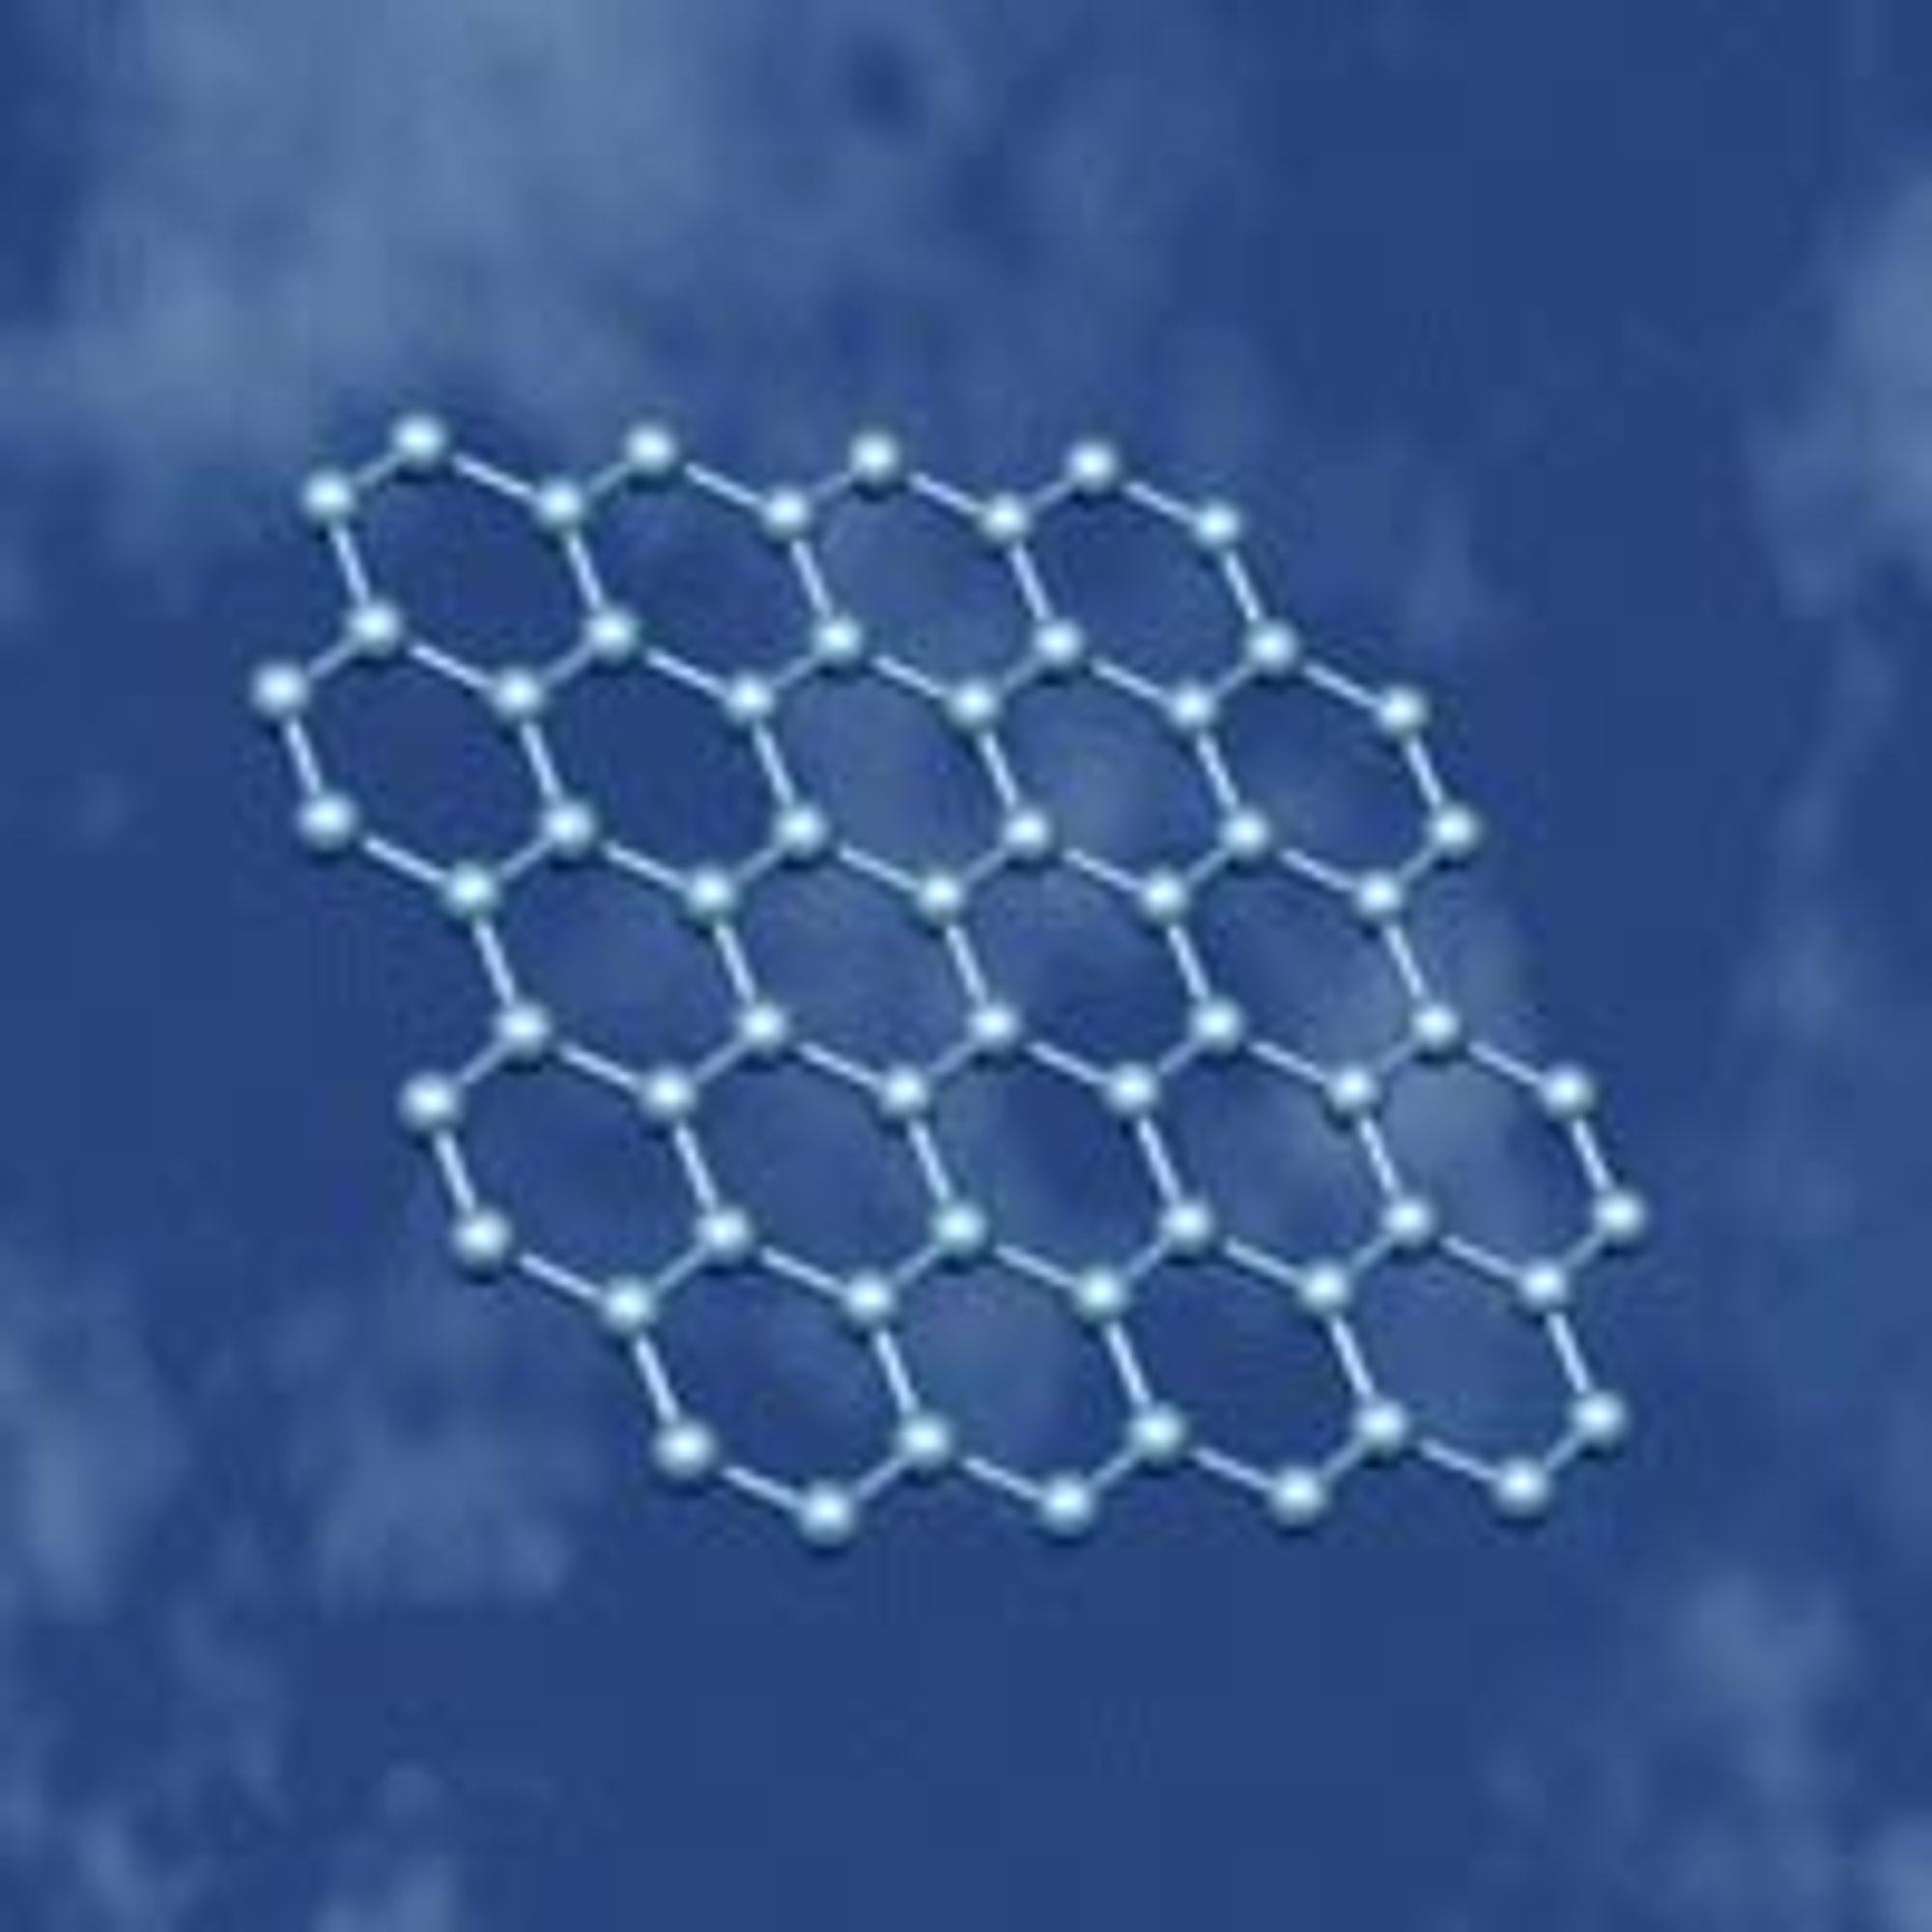 Grafen er et karbonmateriale med bikakestruktur.